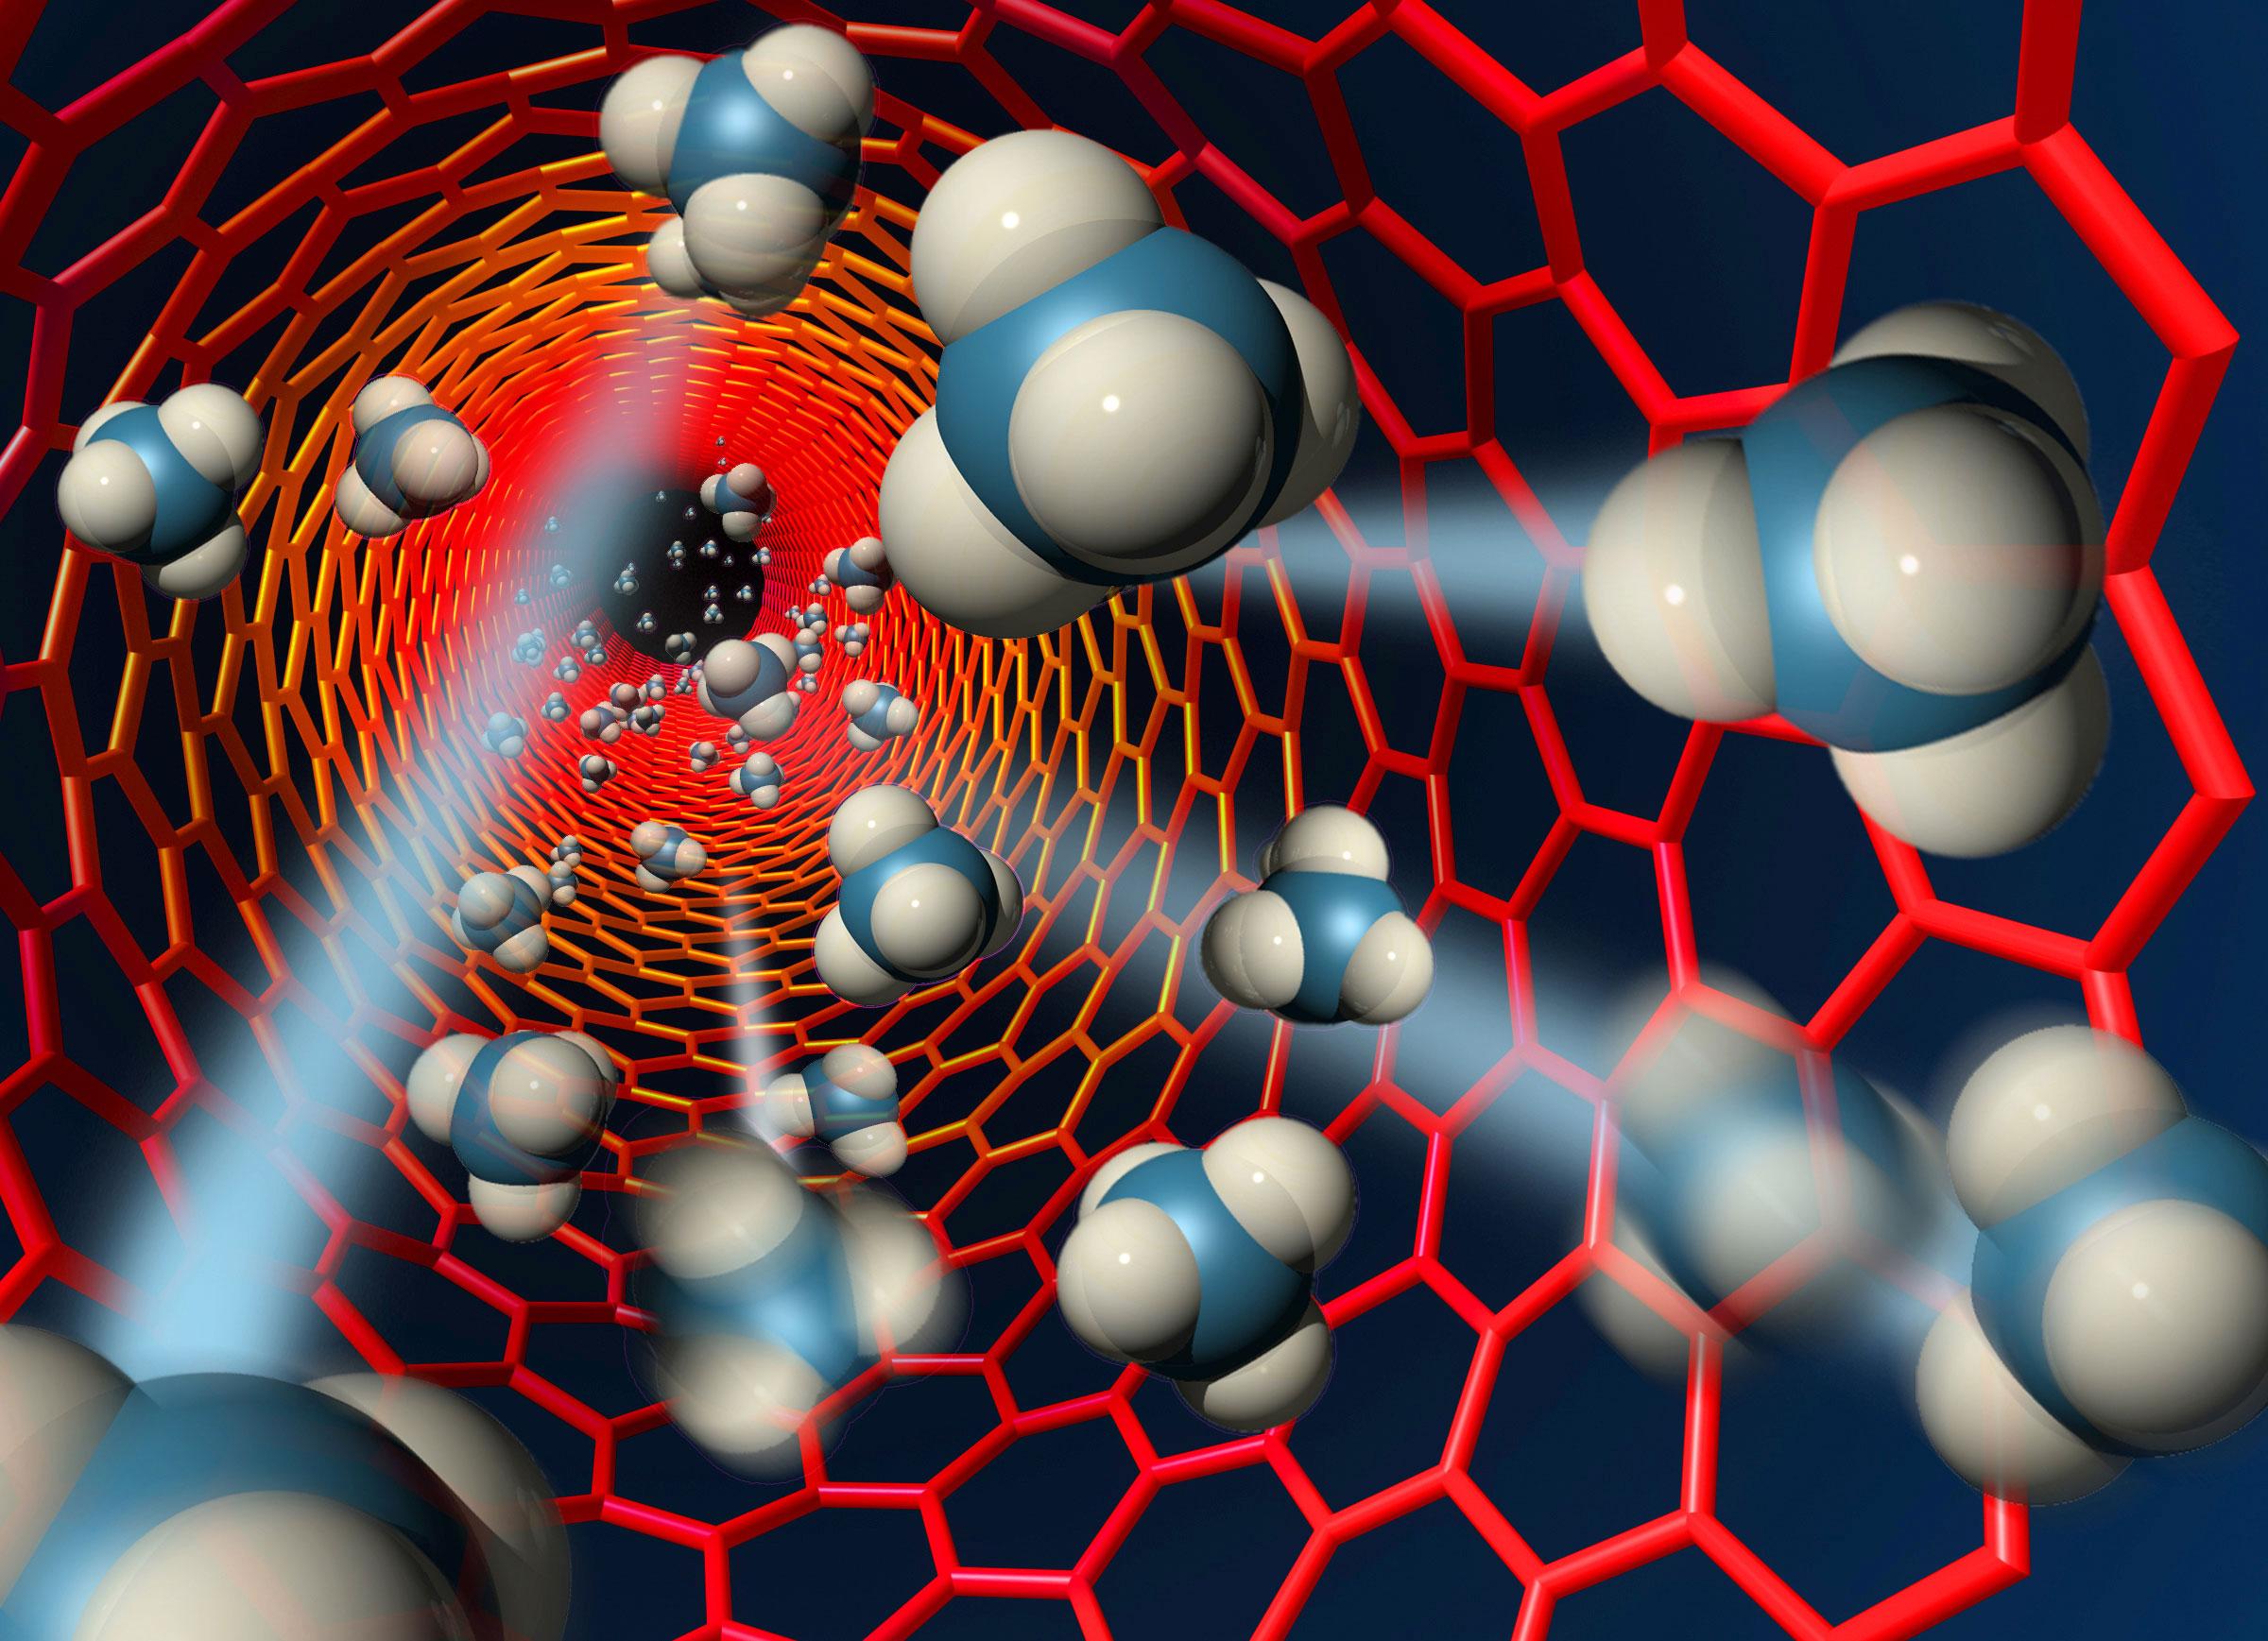 Semana -1445 - 1 Nanotubo